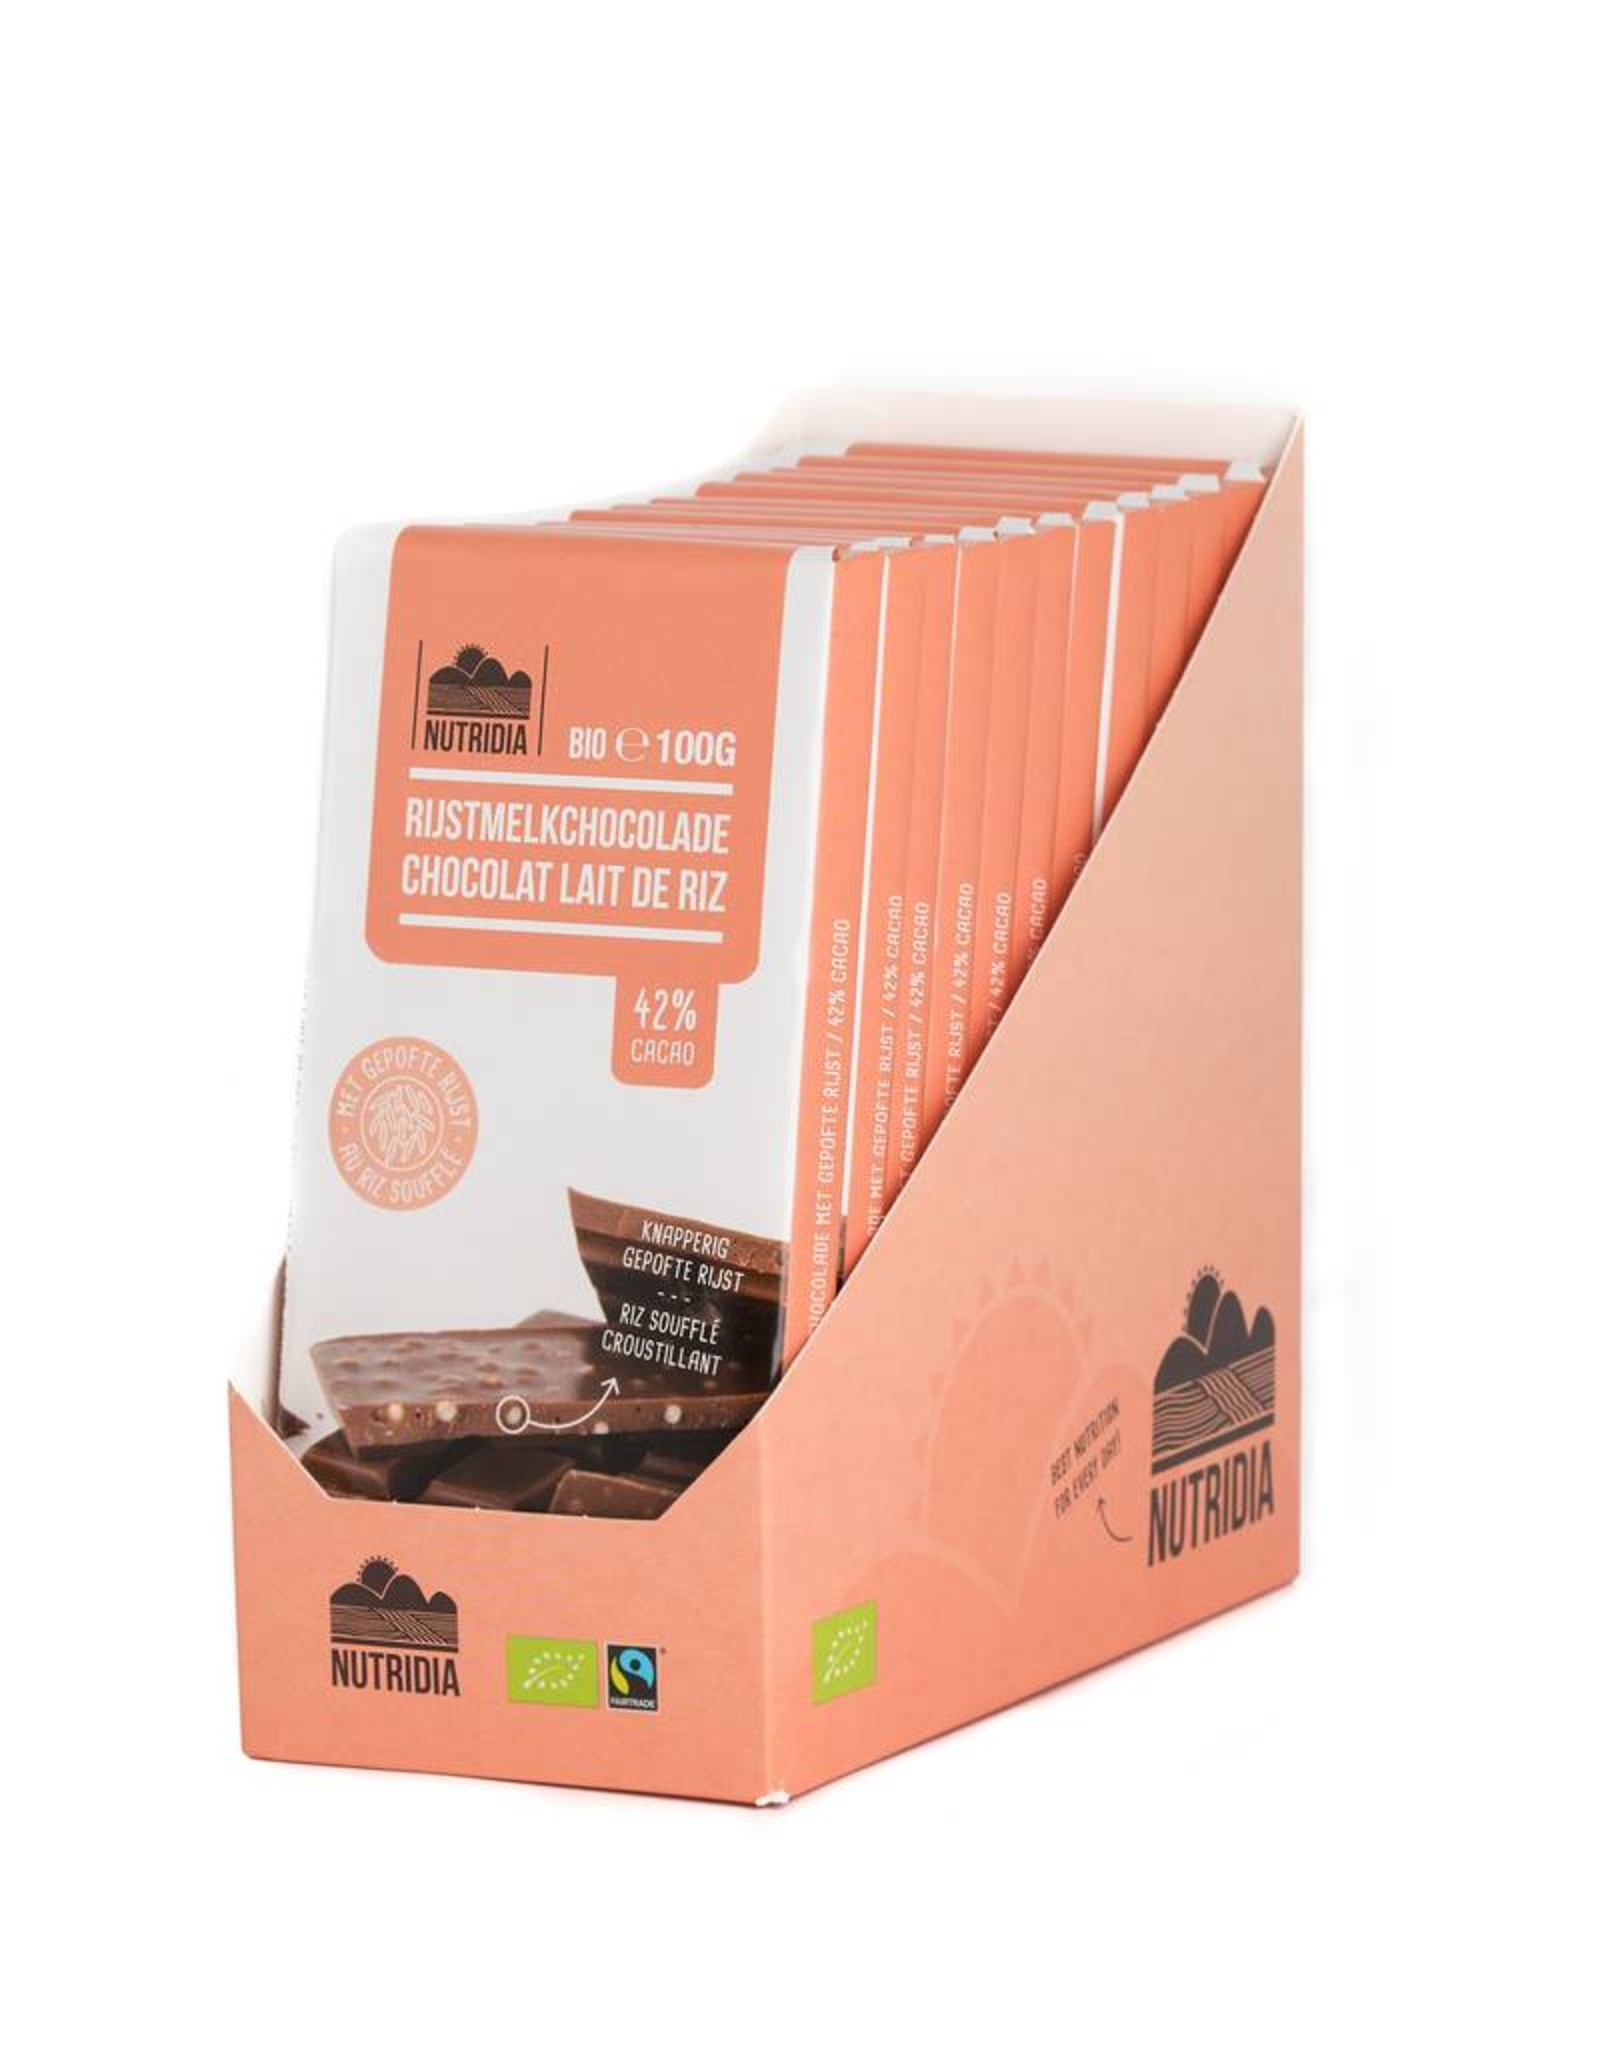 Nutridia Tablet rijstmelkchocolade gepofte rijst bio 100g 12 stuks